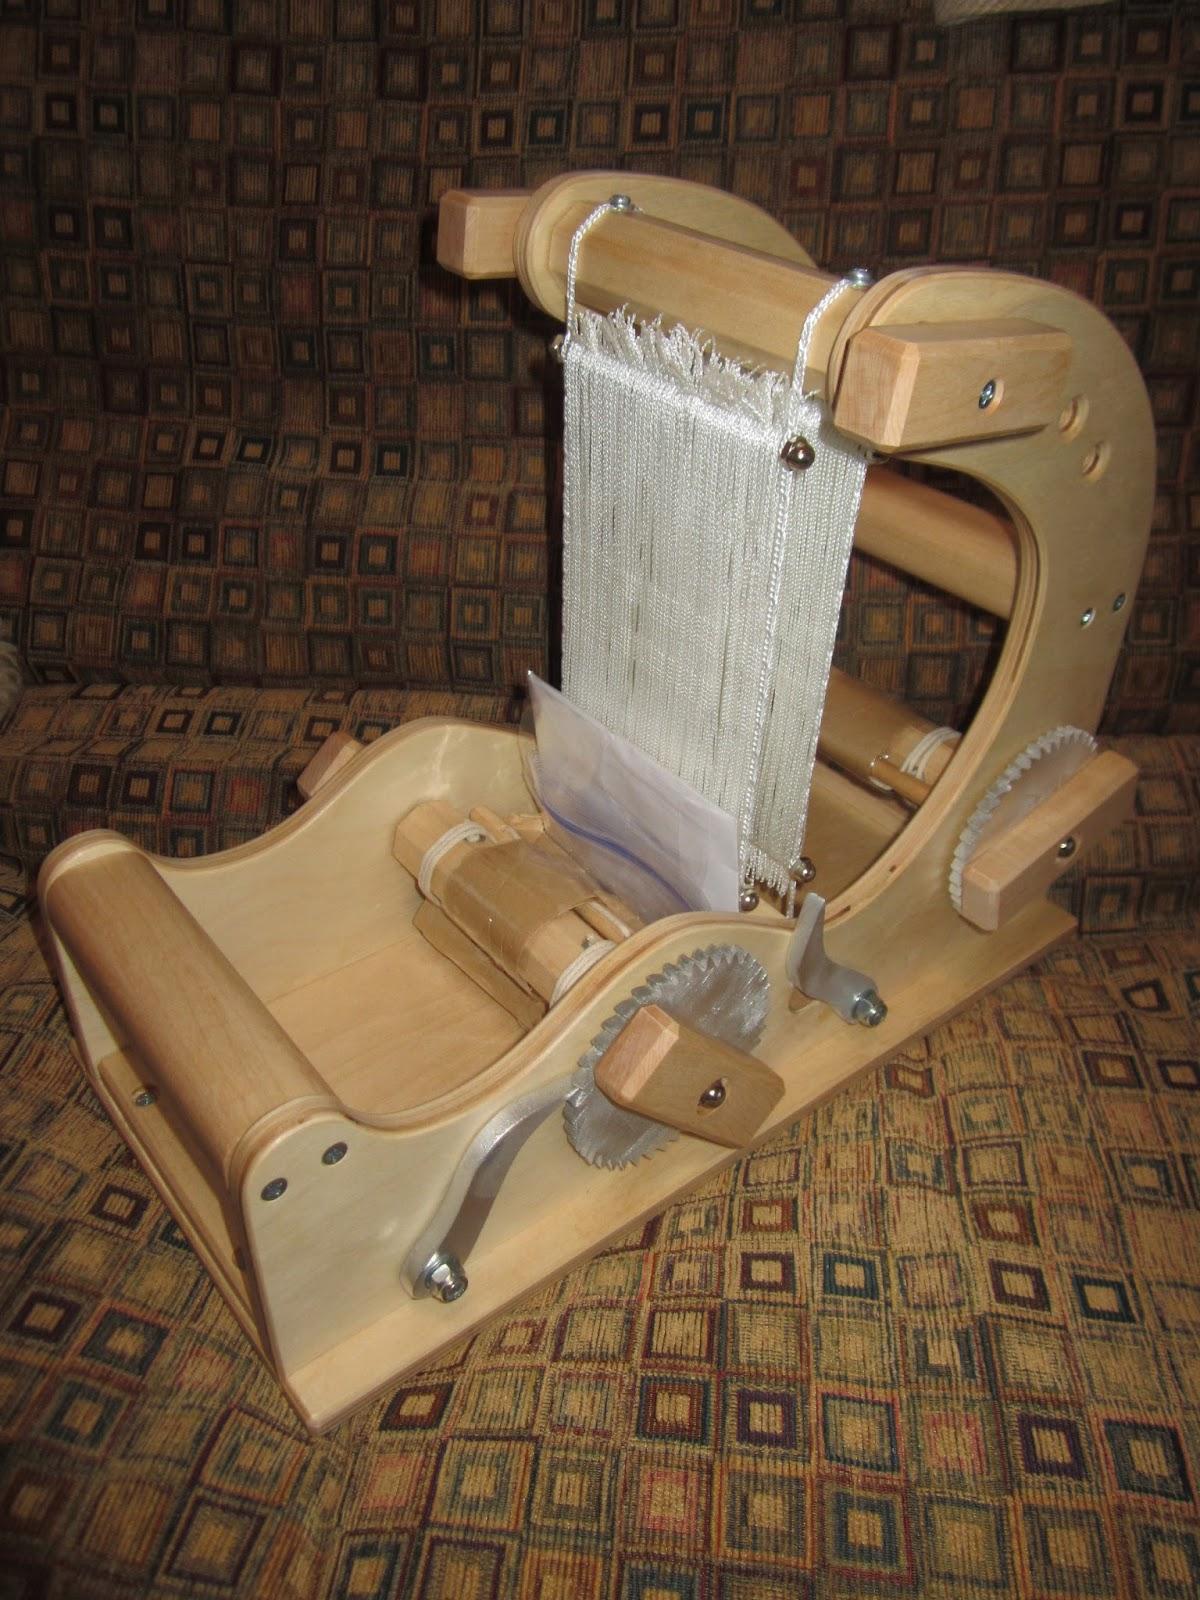 The mini wave loom